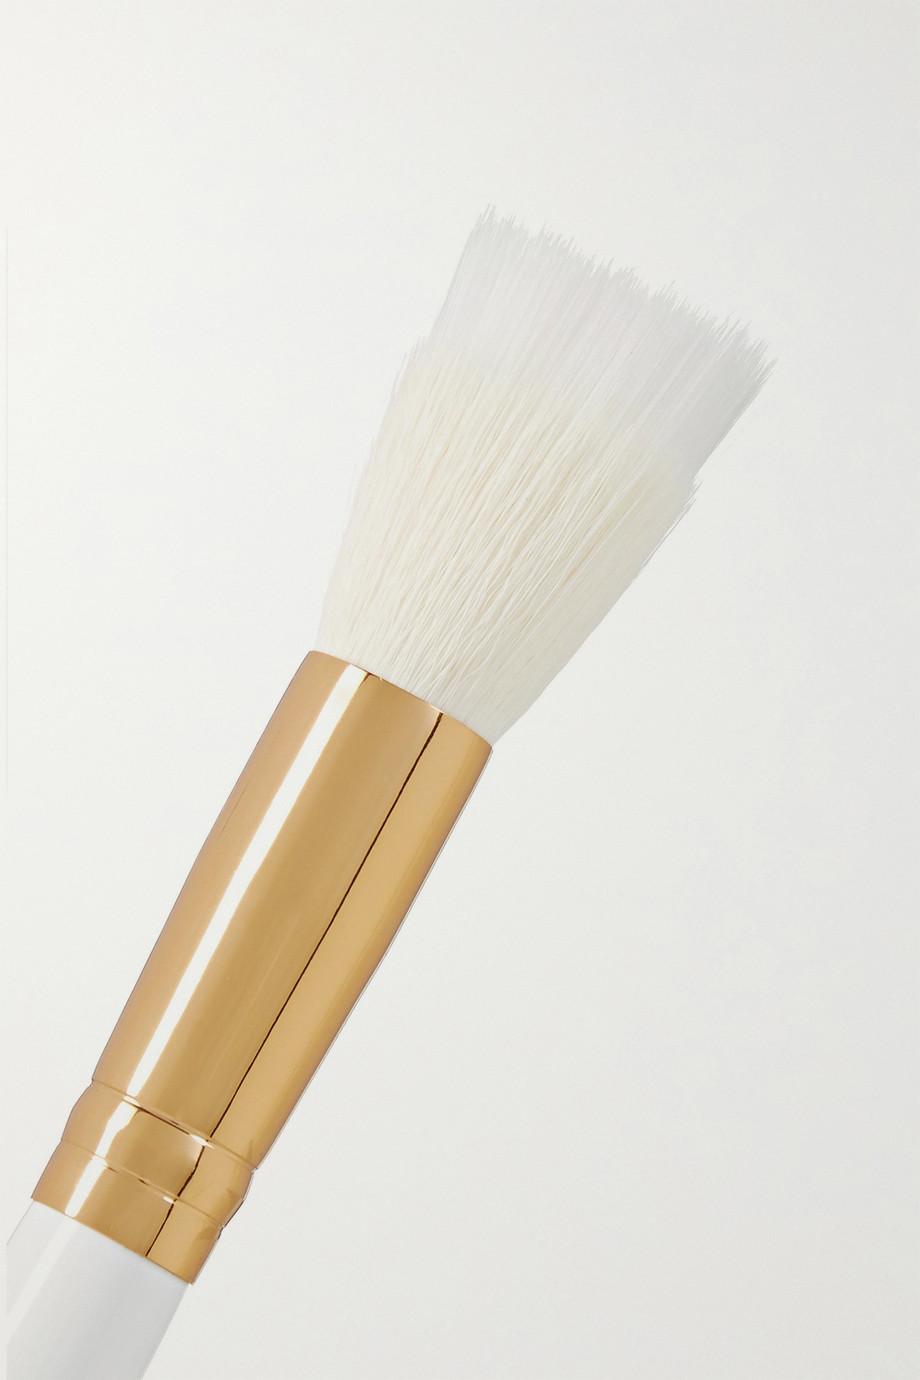 Pat McGrath Labs Skin Fetish Buffer Brush 003